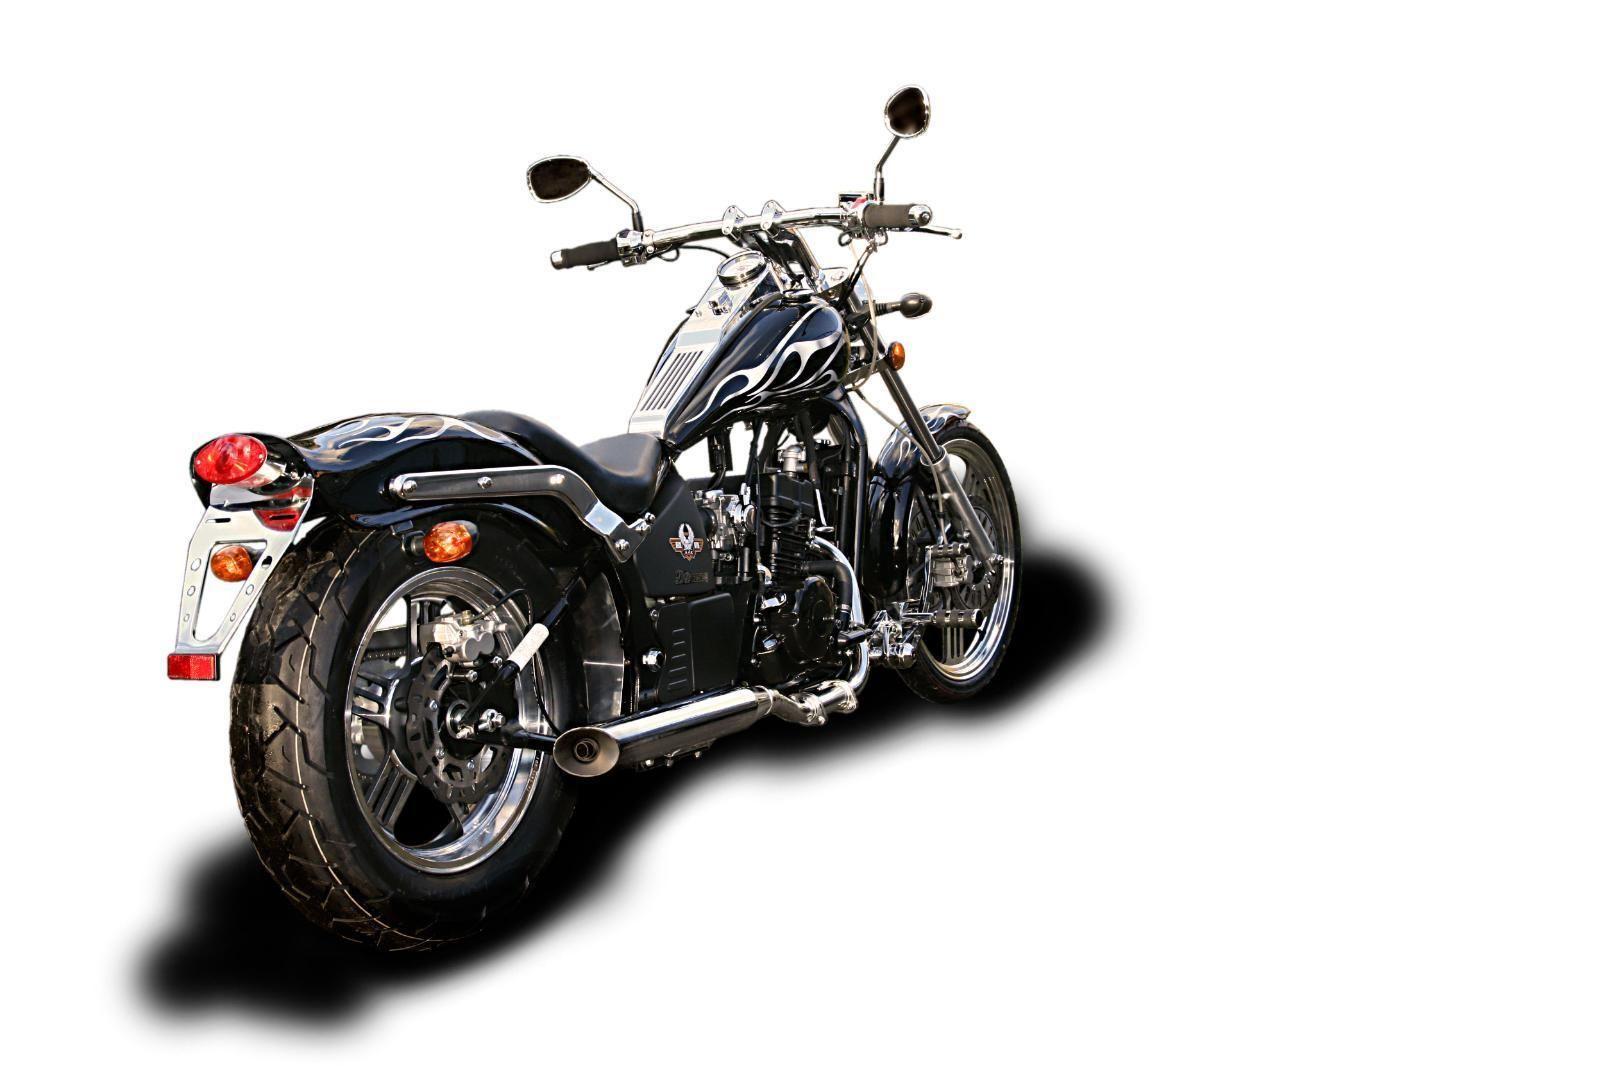 ajs regal raptor eos 125cc custom motorcycle cruiser black learner legal 350cc. Black Bedroom Furniture Sets. Home Design Ideas